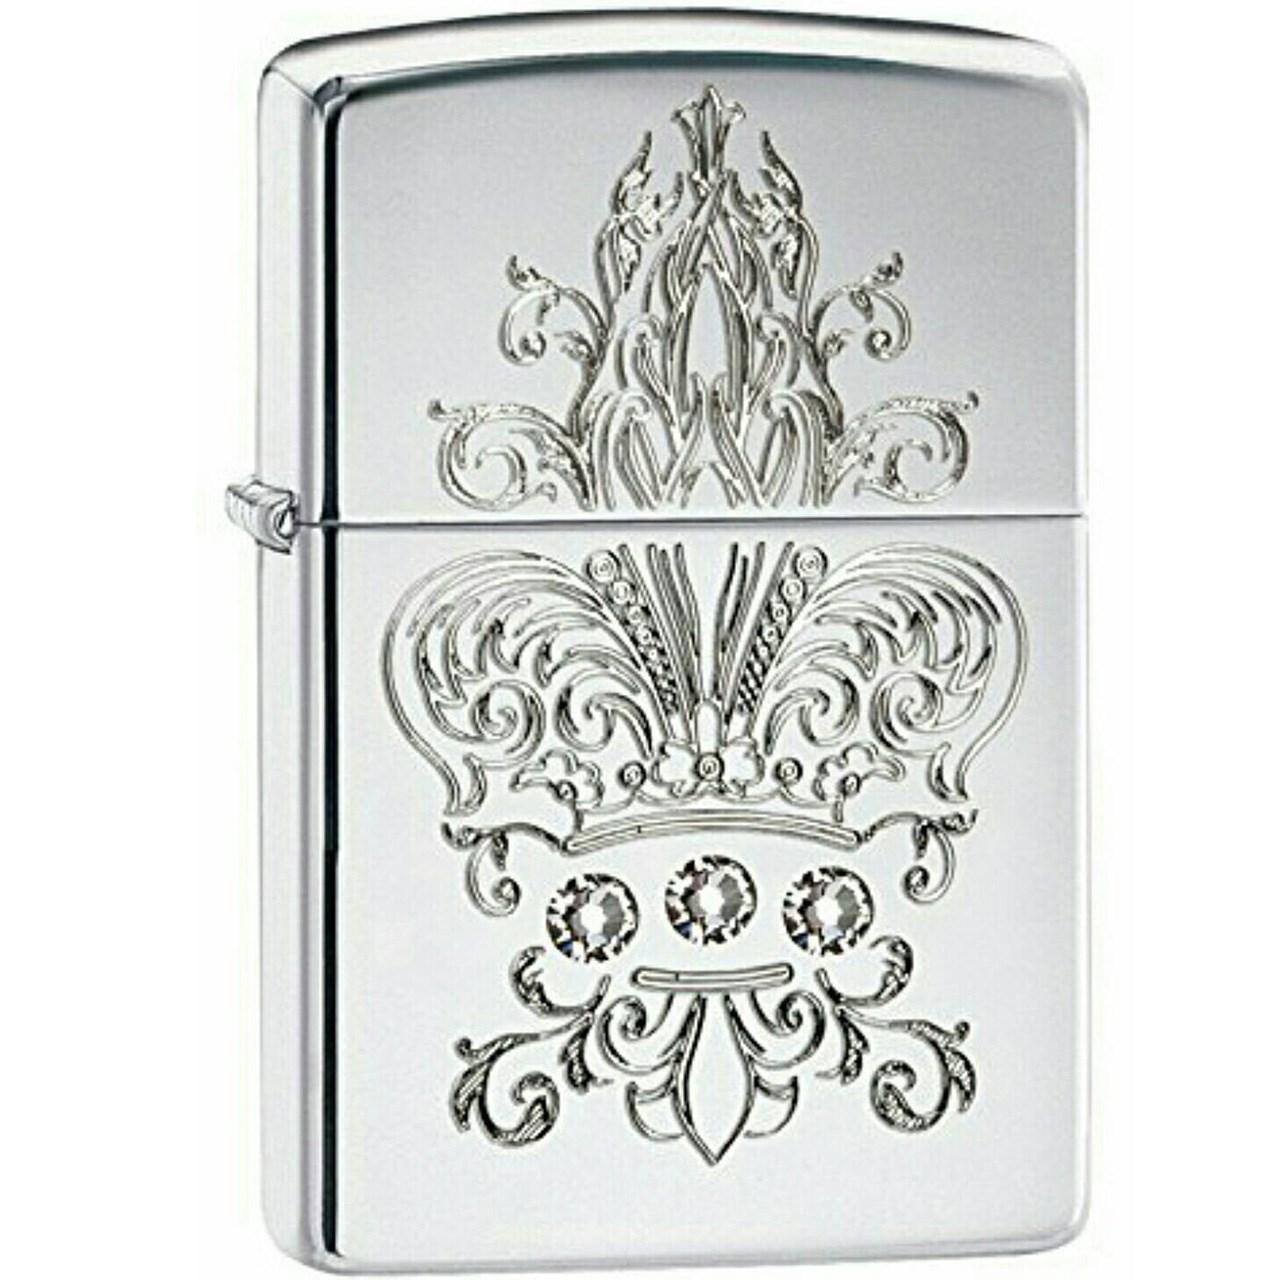 فندک زیپو مدل Crown Fleur De Lis کد 28805